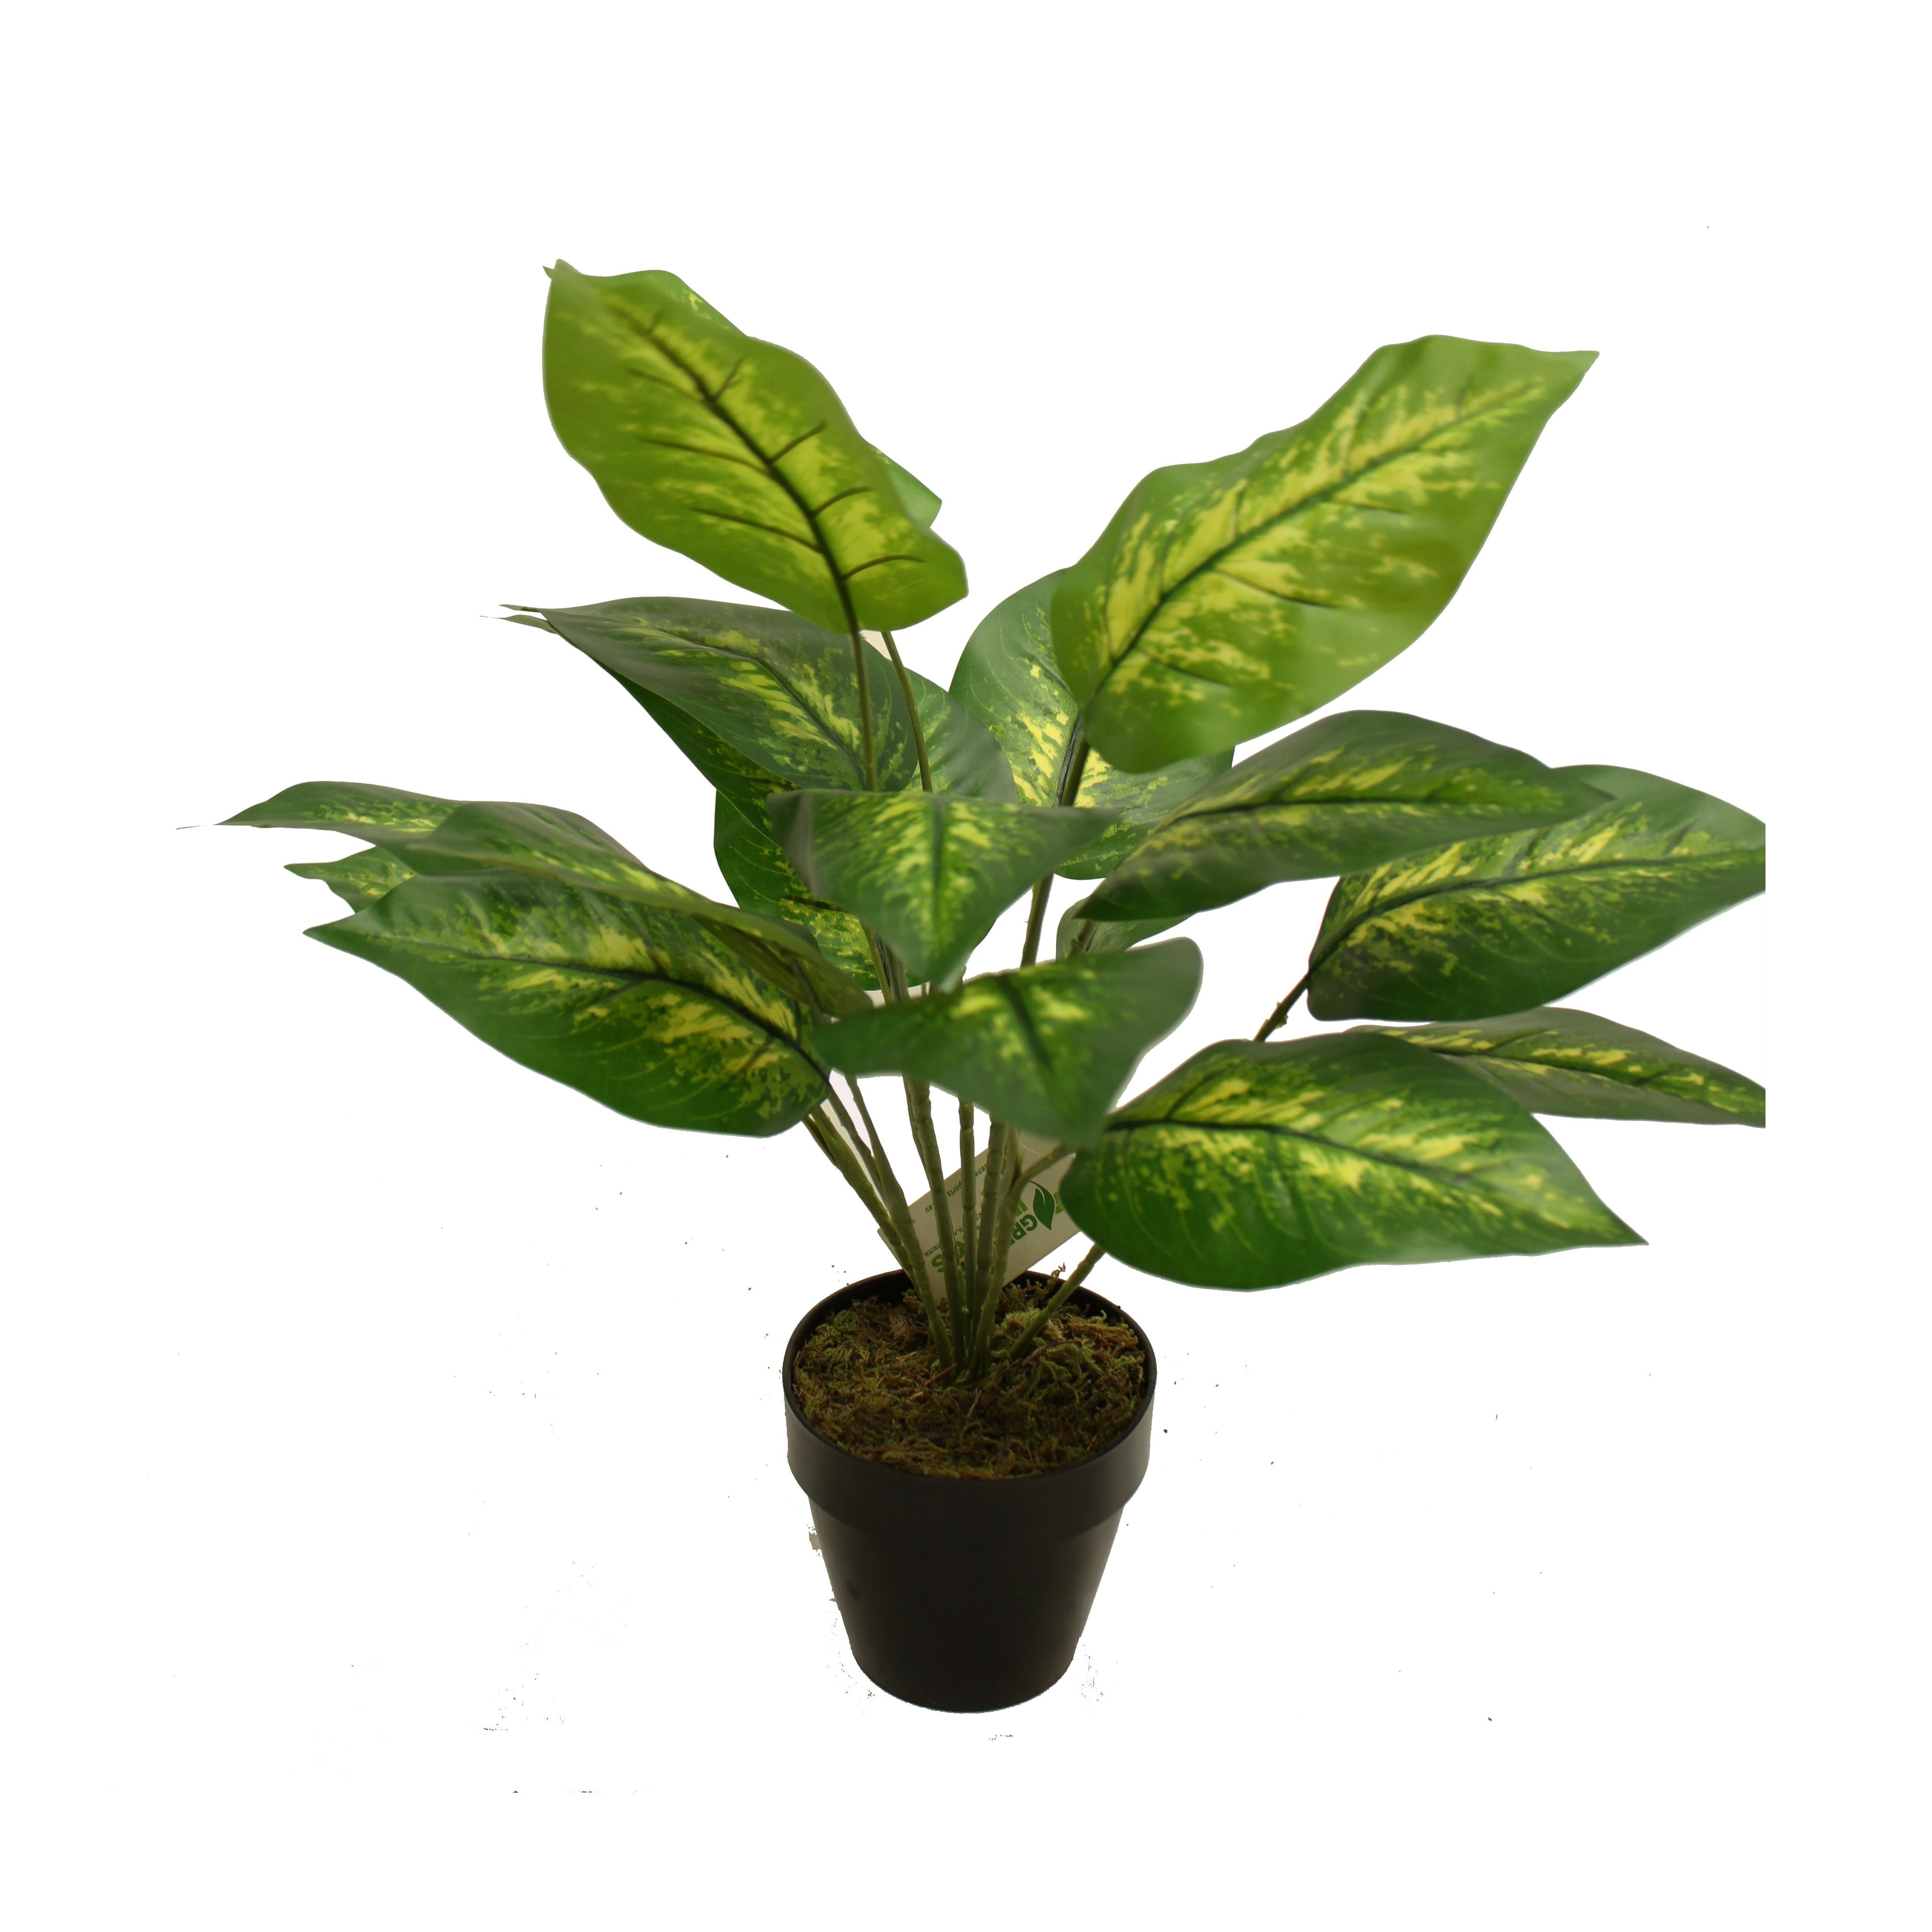 ARTIFICIAL DIEFFENBACHIA PLANT 46CM IN BASIC POT